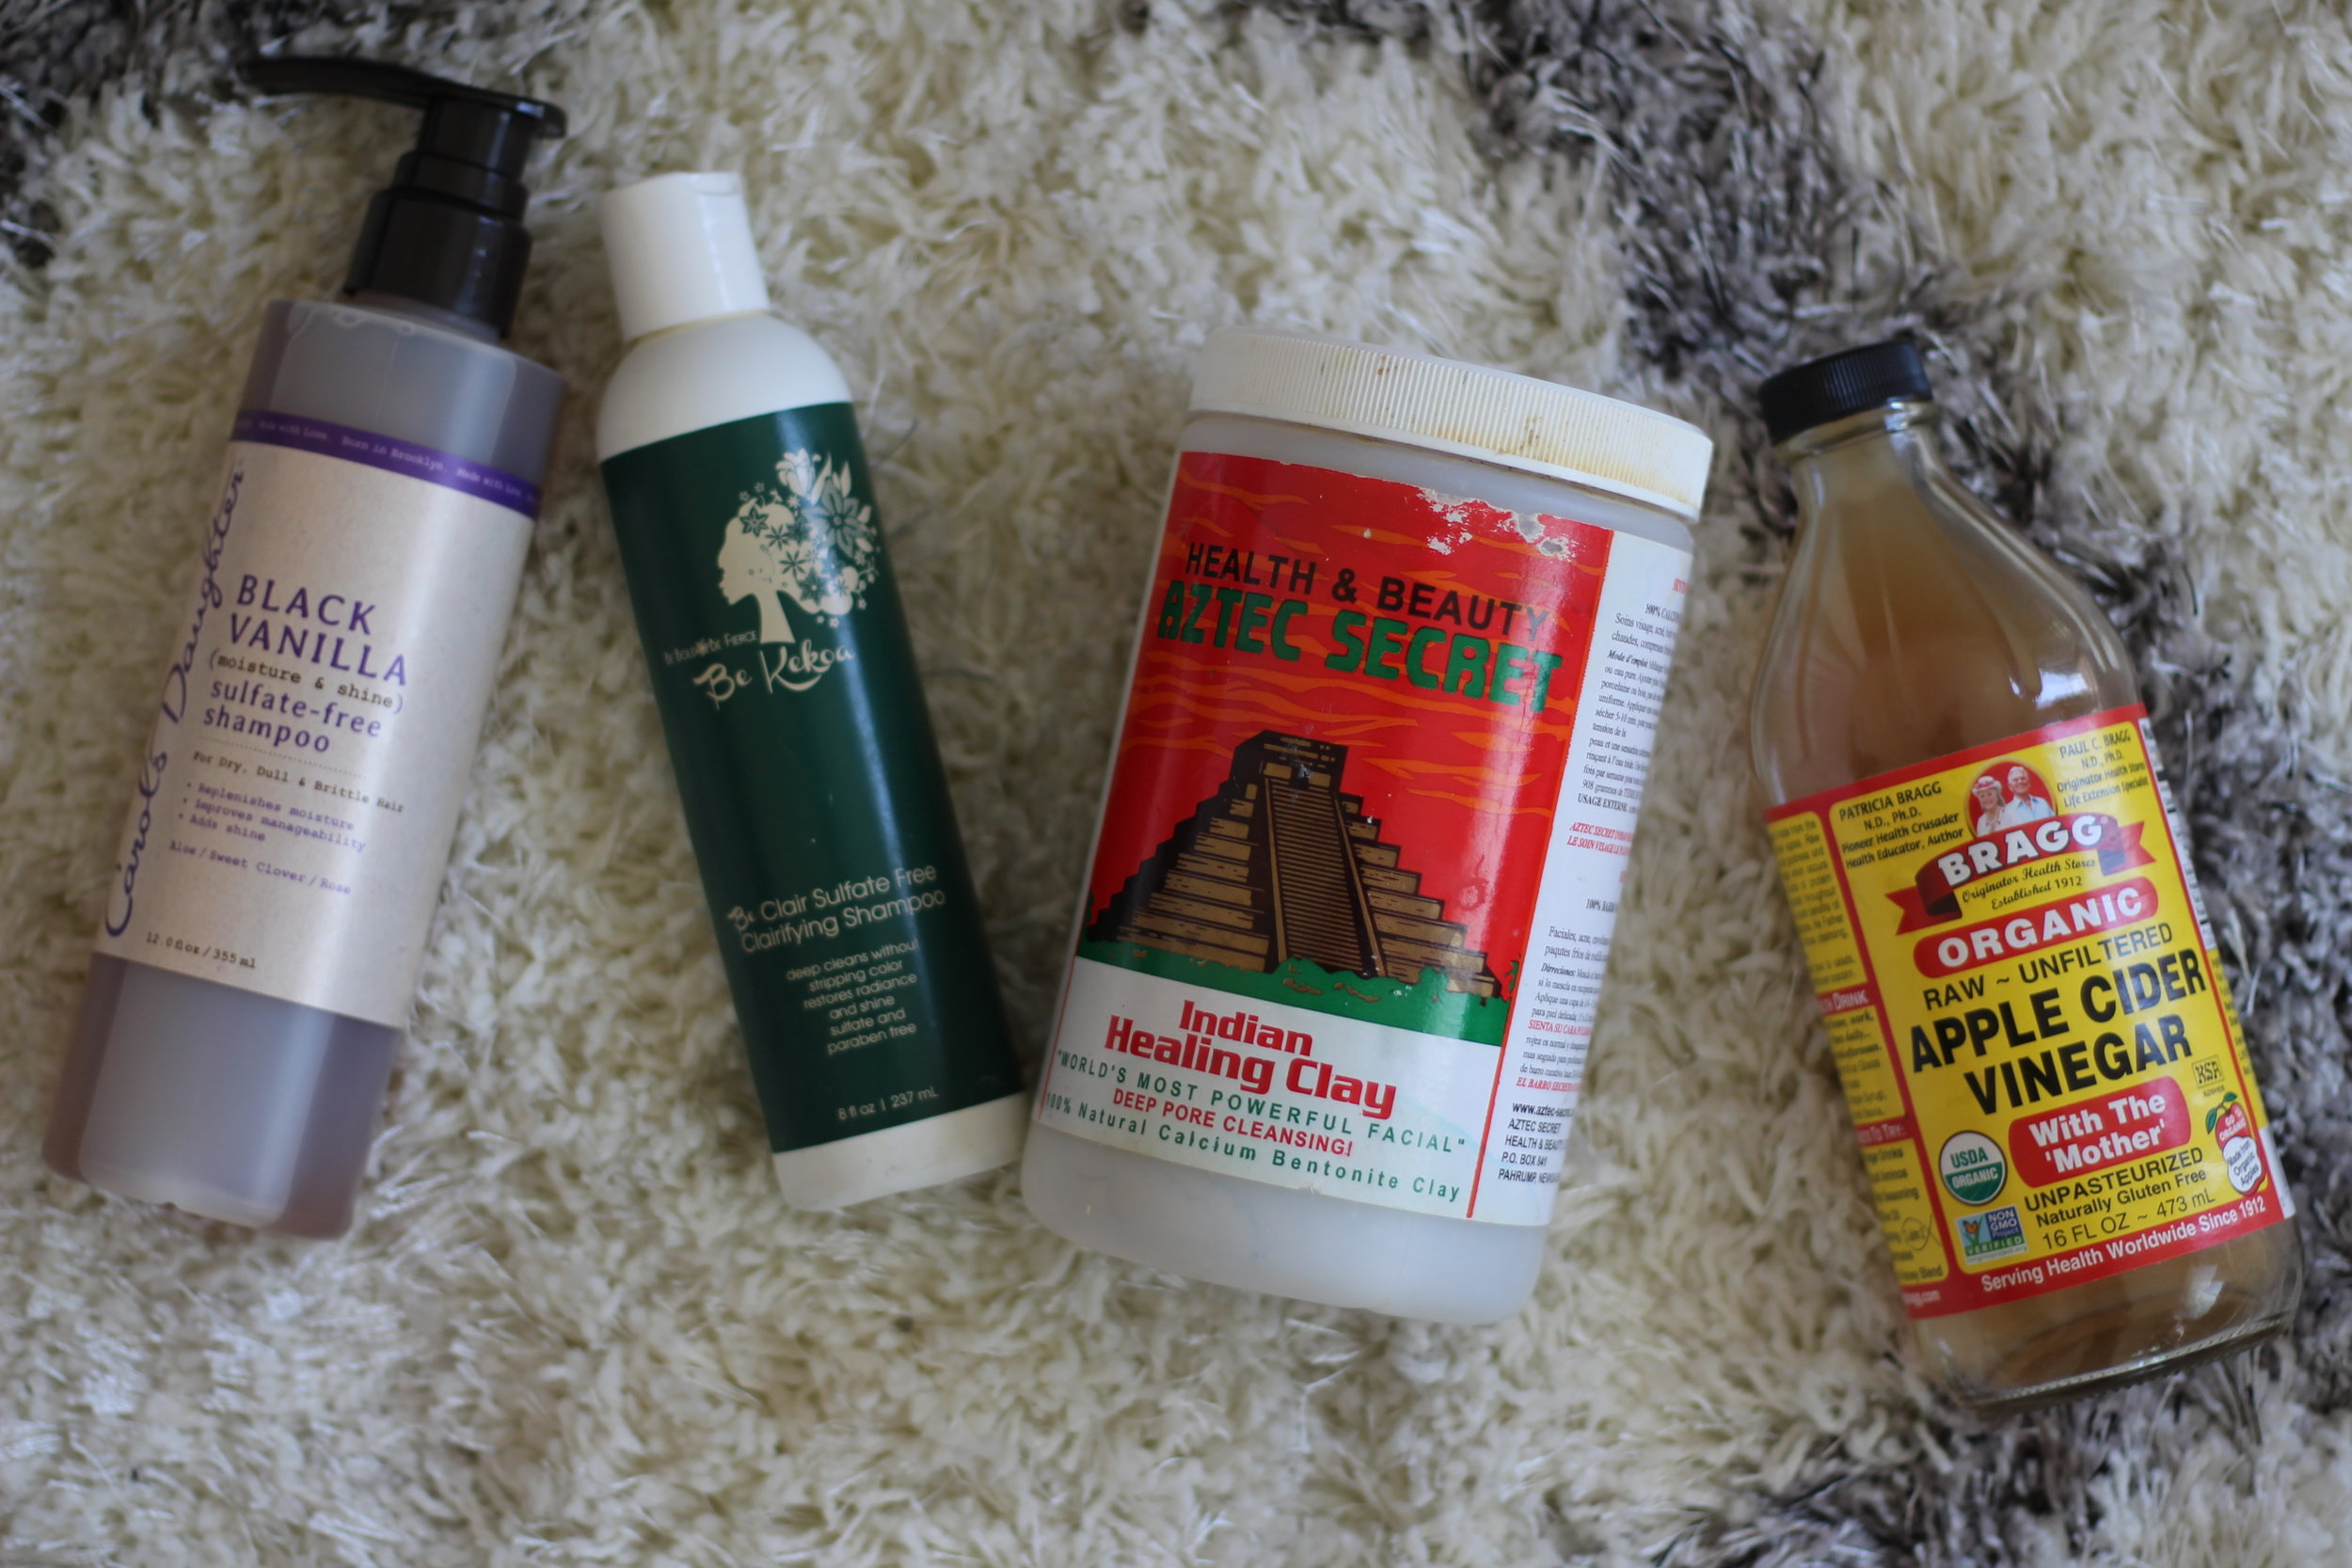 Carol's Daughter Black Vanilla Shampoo, Bekekoa Be Clair Sulfate free shampoo,Aztec Indian Clay, and Apple Cider Vinegar